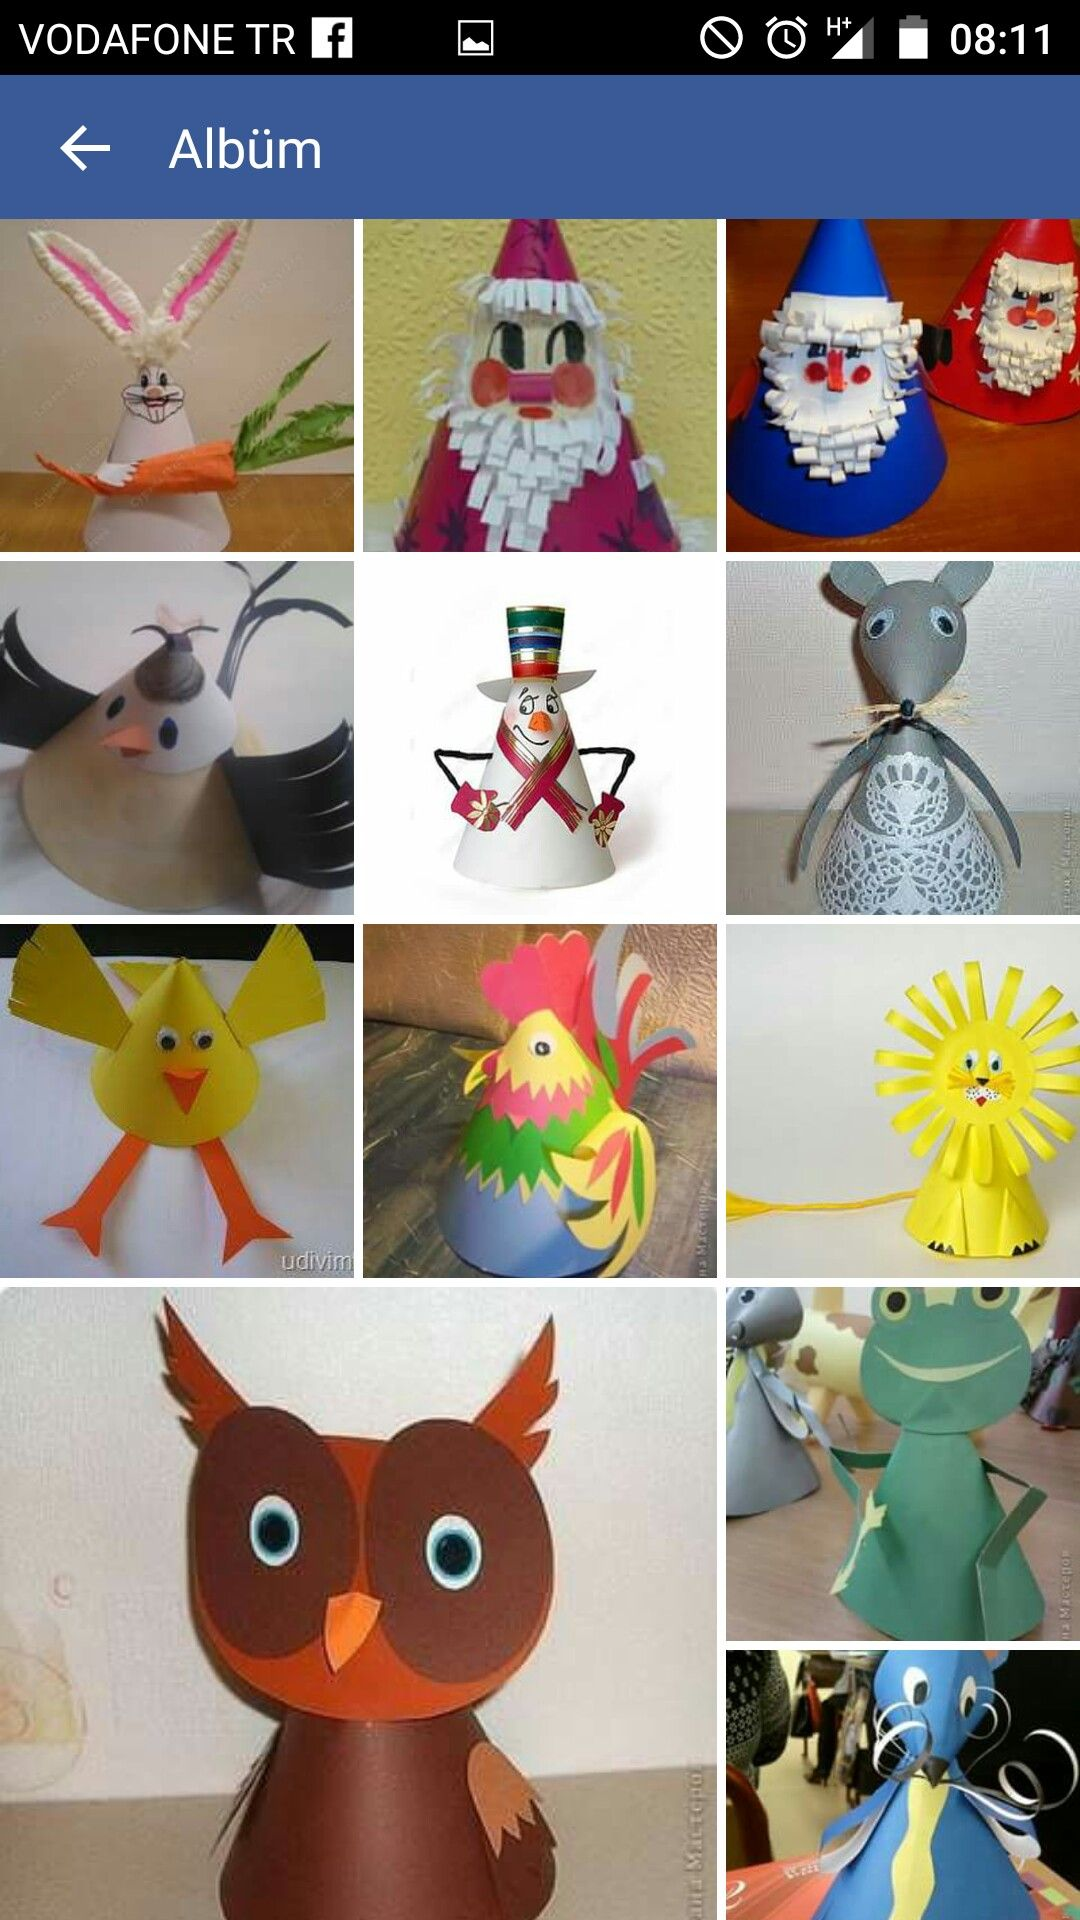 Vodafone toys images  Инна Дигай zubeinna on Pinterest